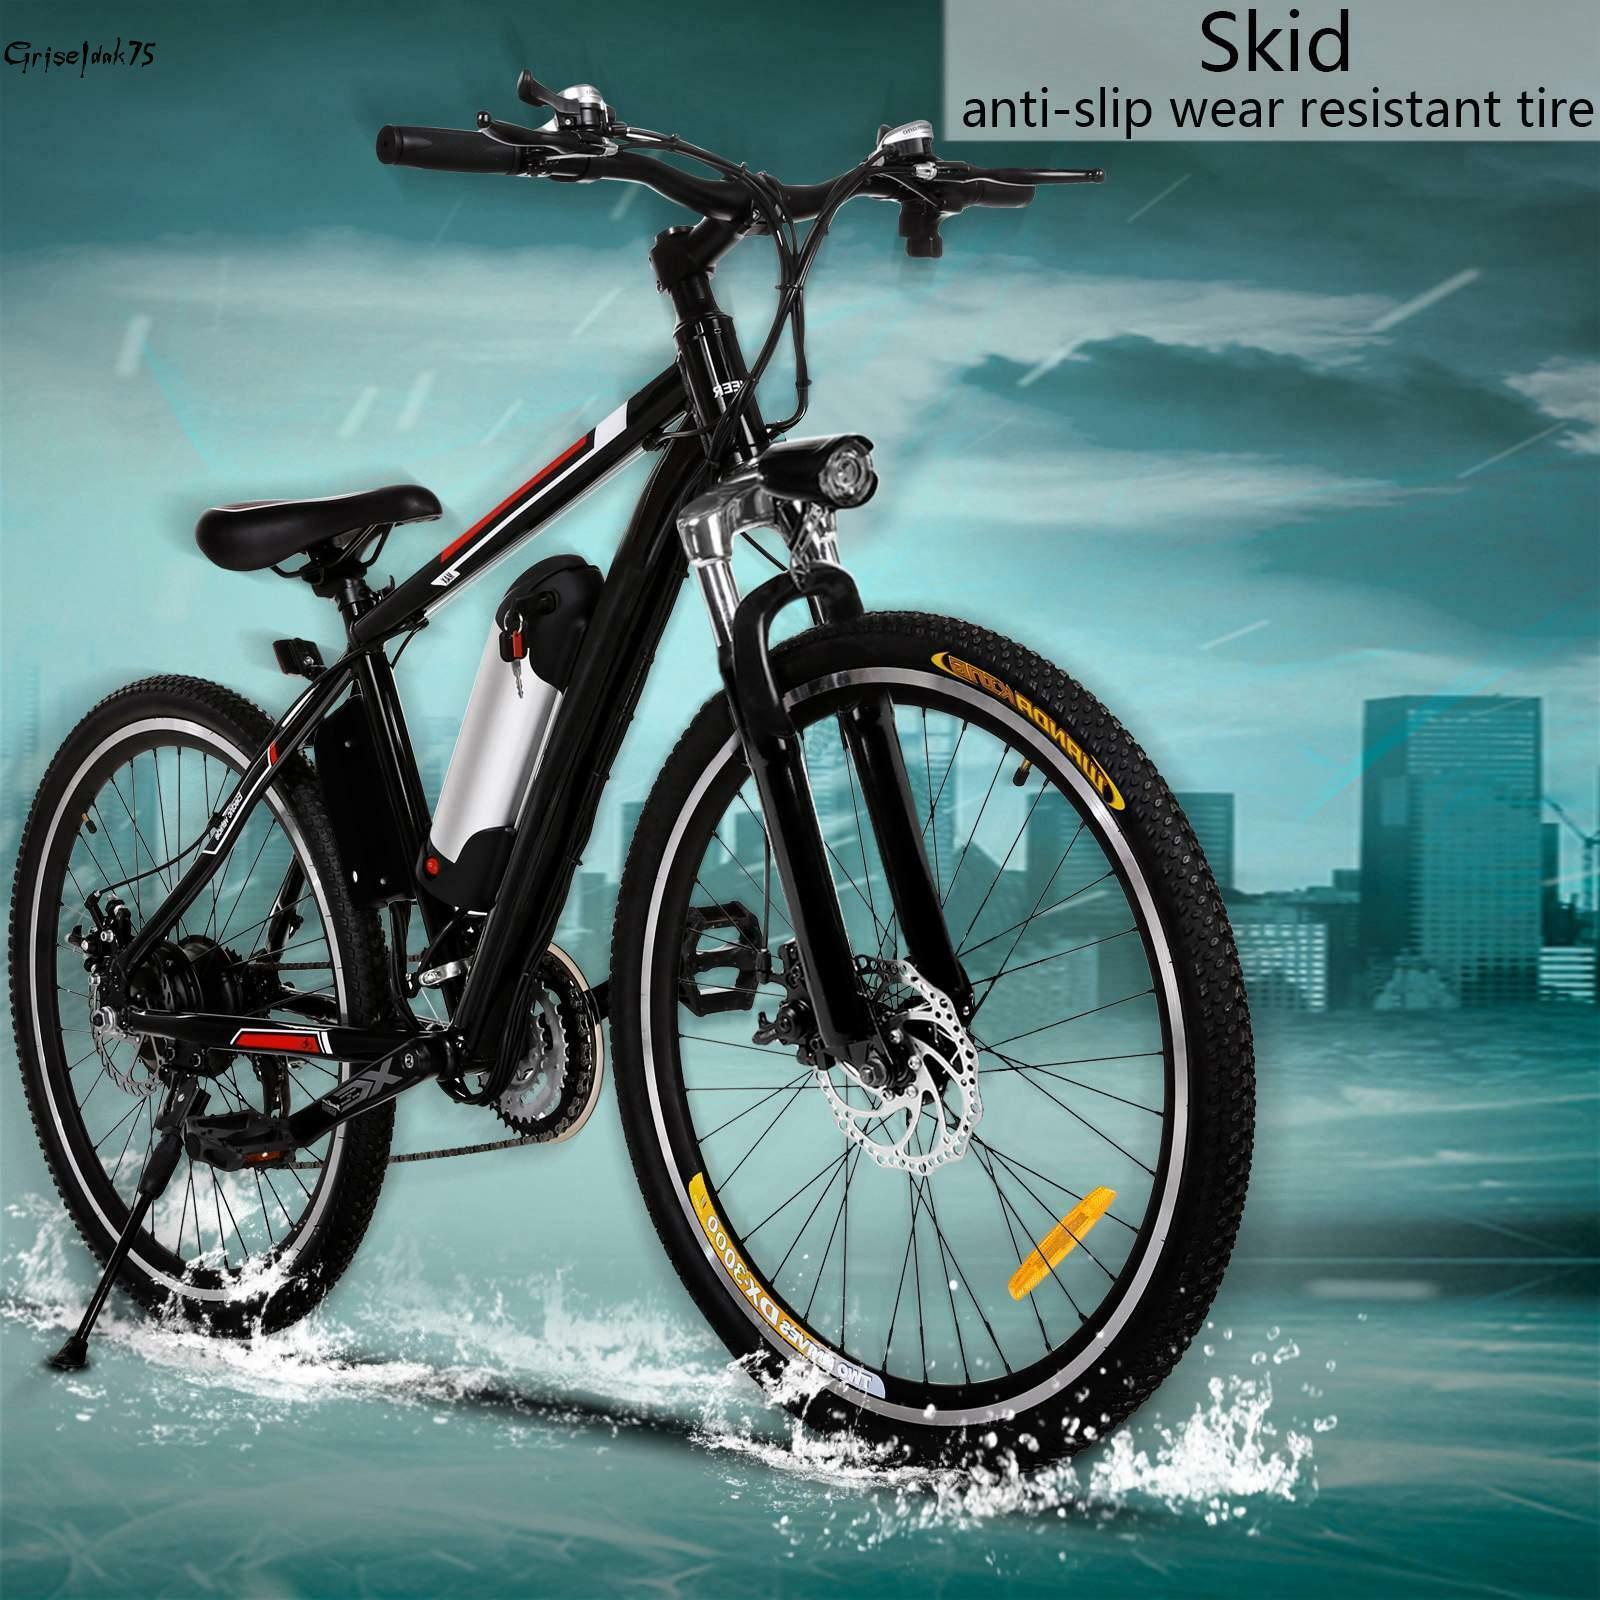 26 Zoll MountainBike E-bike Elektro-Fahrrad Fahrrad Klapprad 21 GANG 35km/h Neu